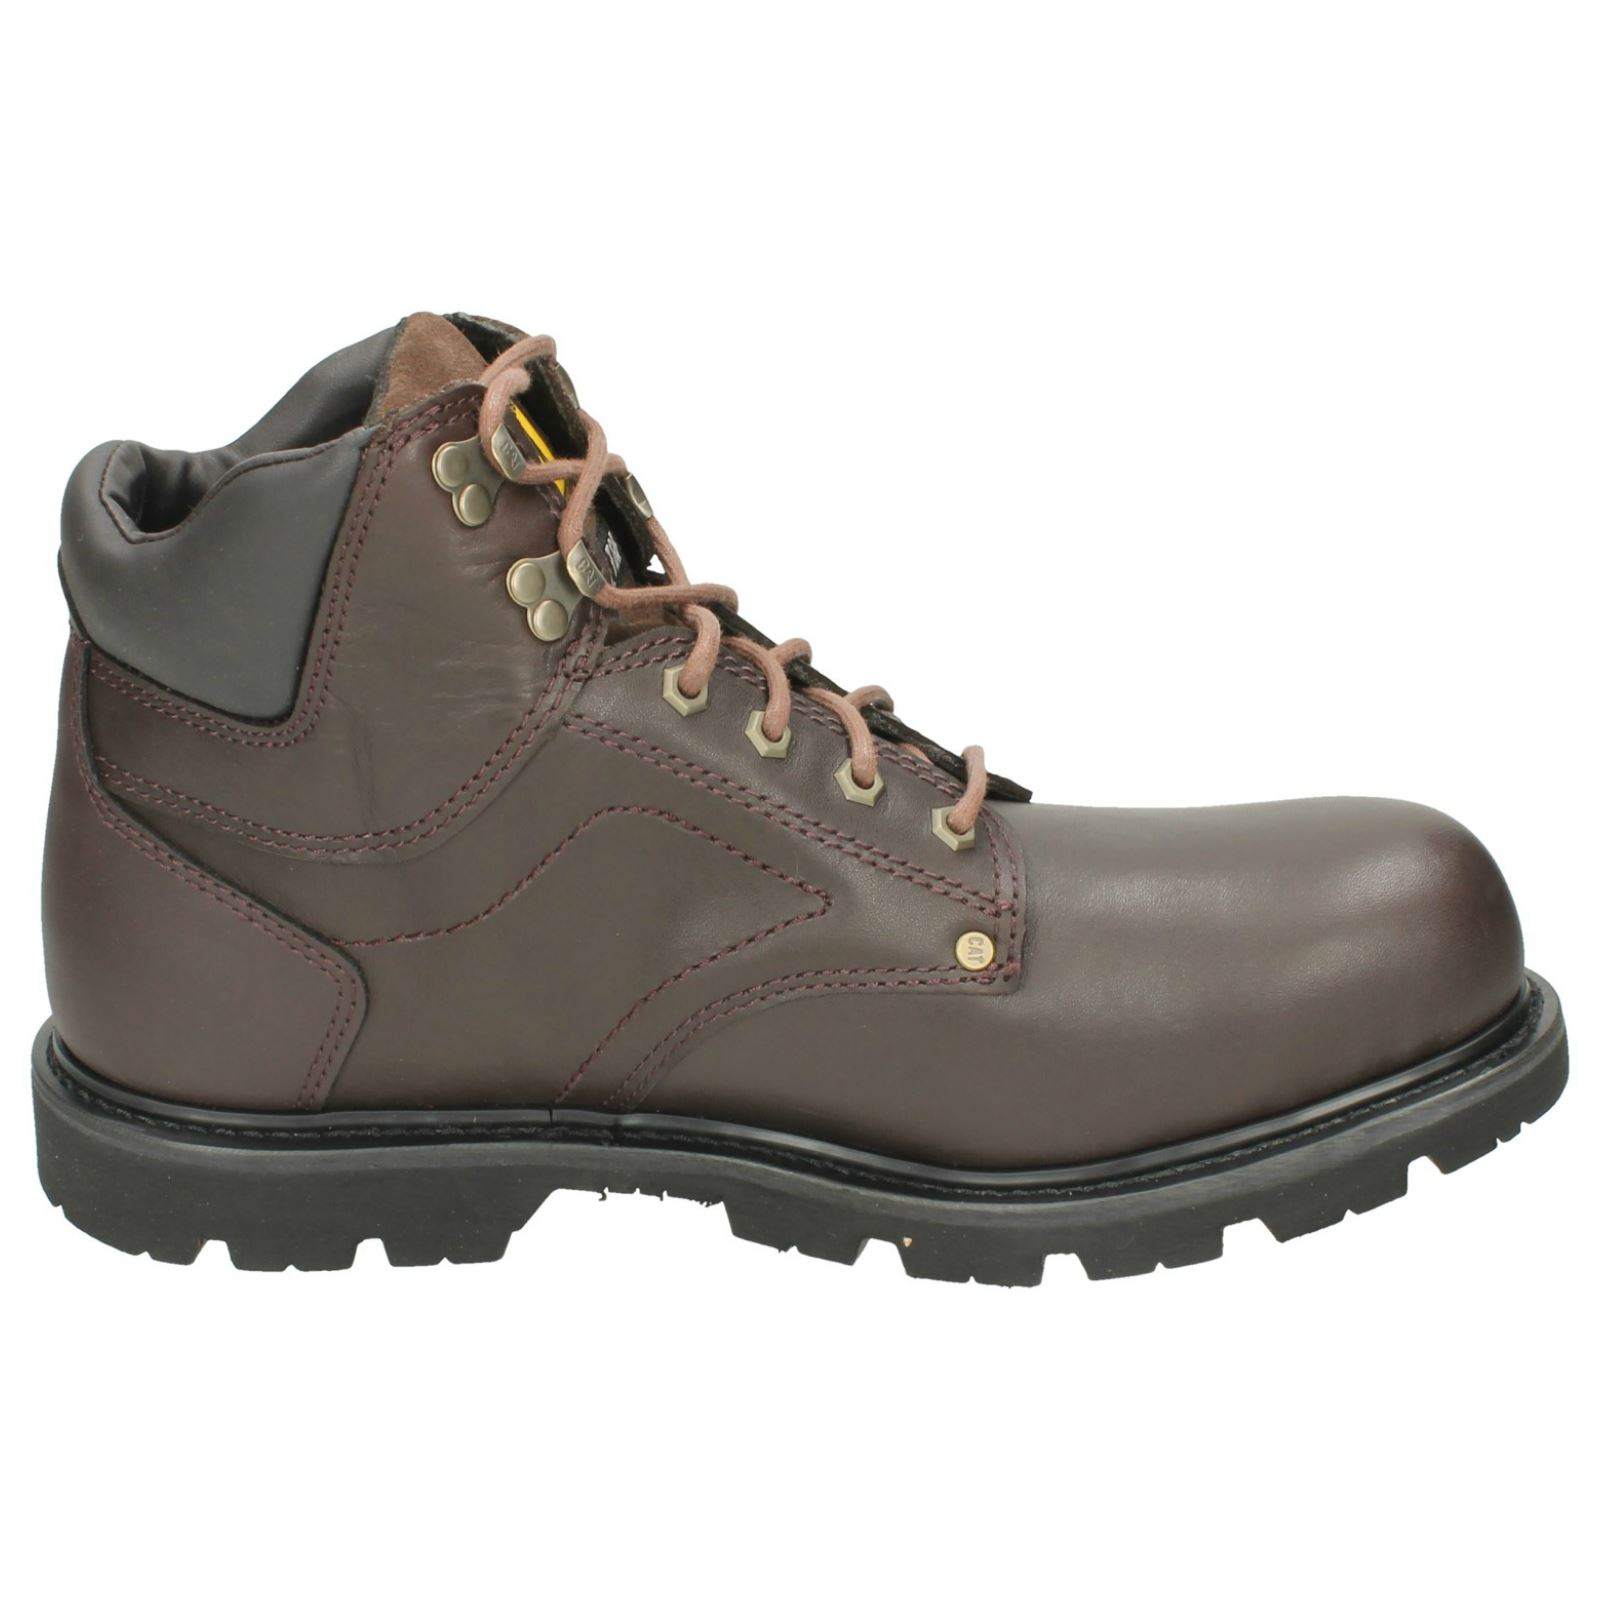 Mens Caterpillar Steel Toe Cap Ankle Boots Grouser ST